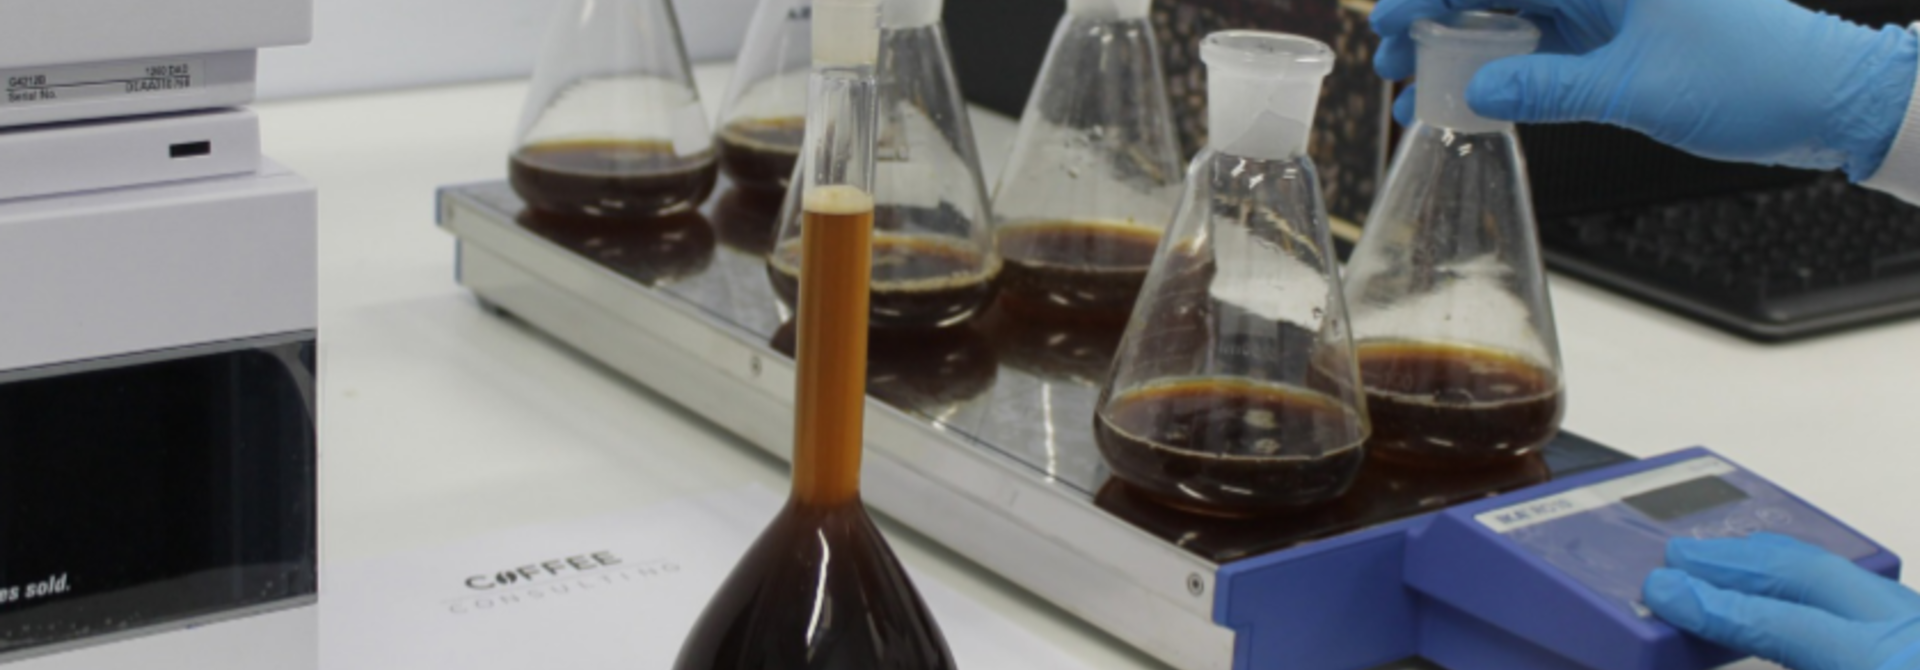 Koffie, prestatie en herstel: mét labresultaten